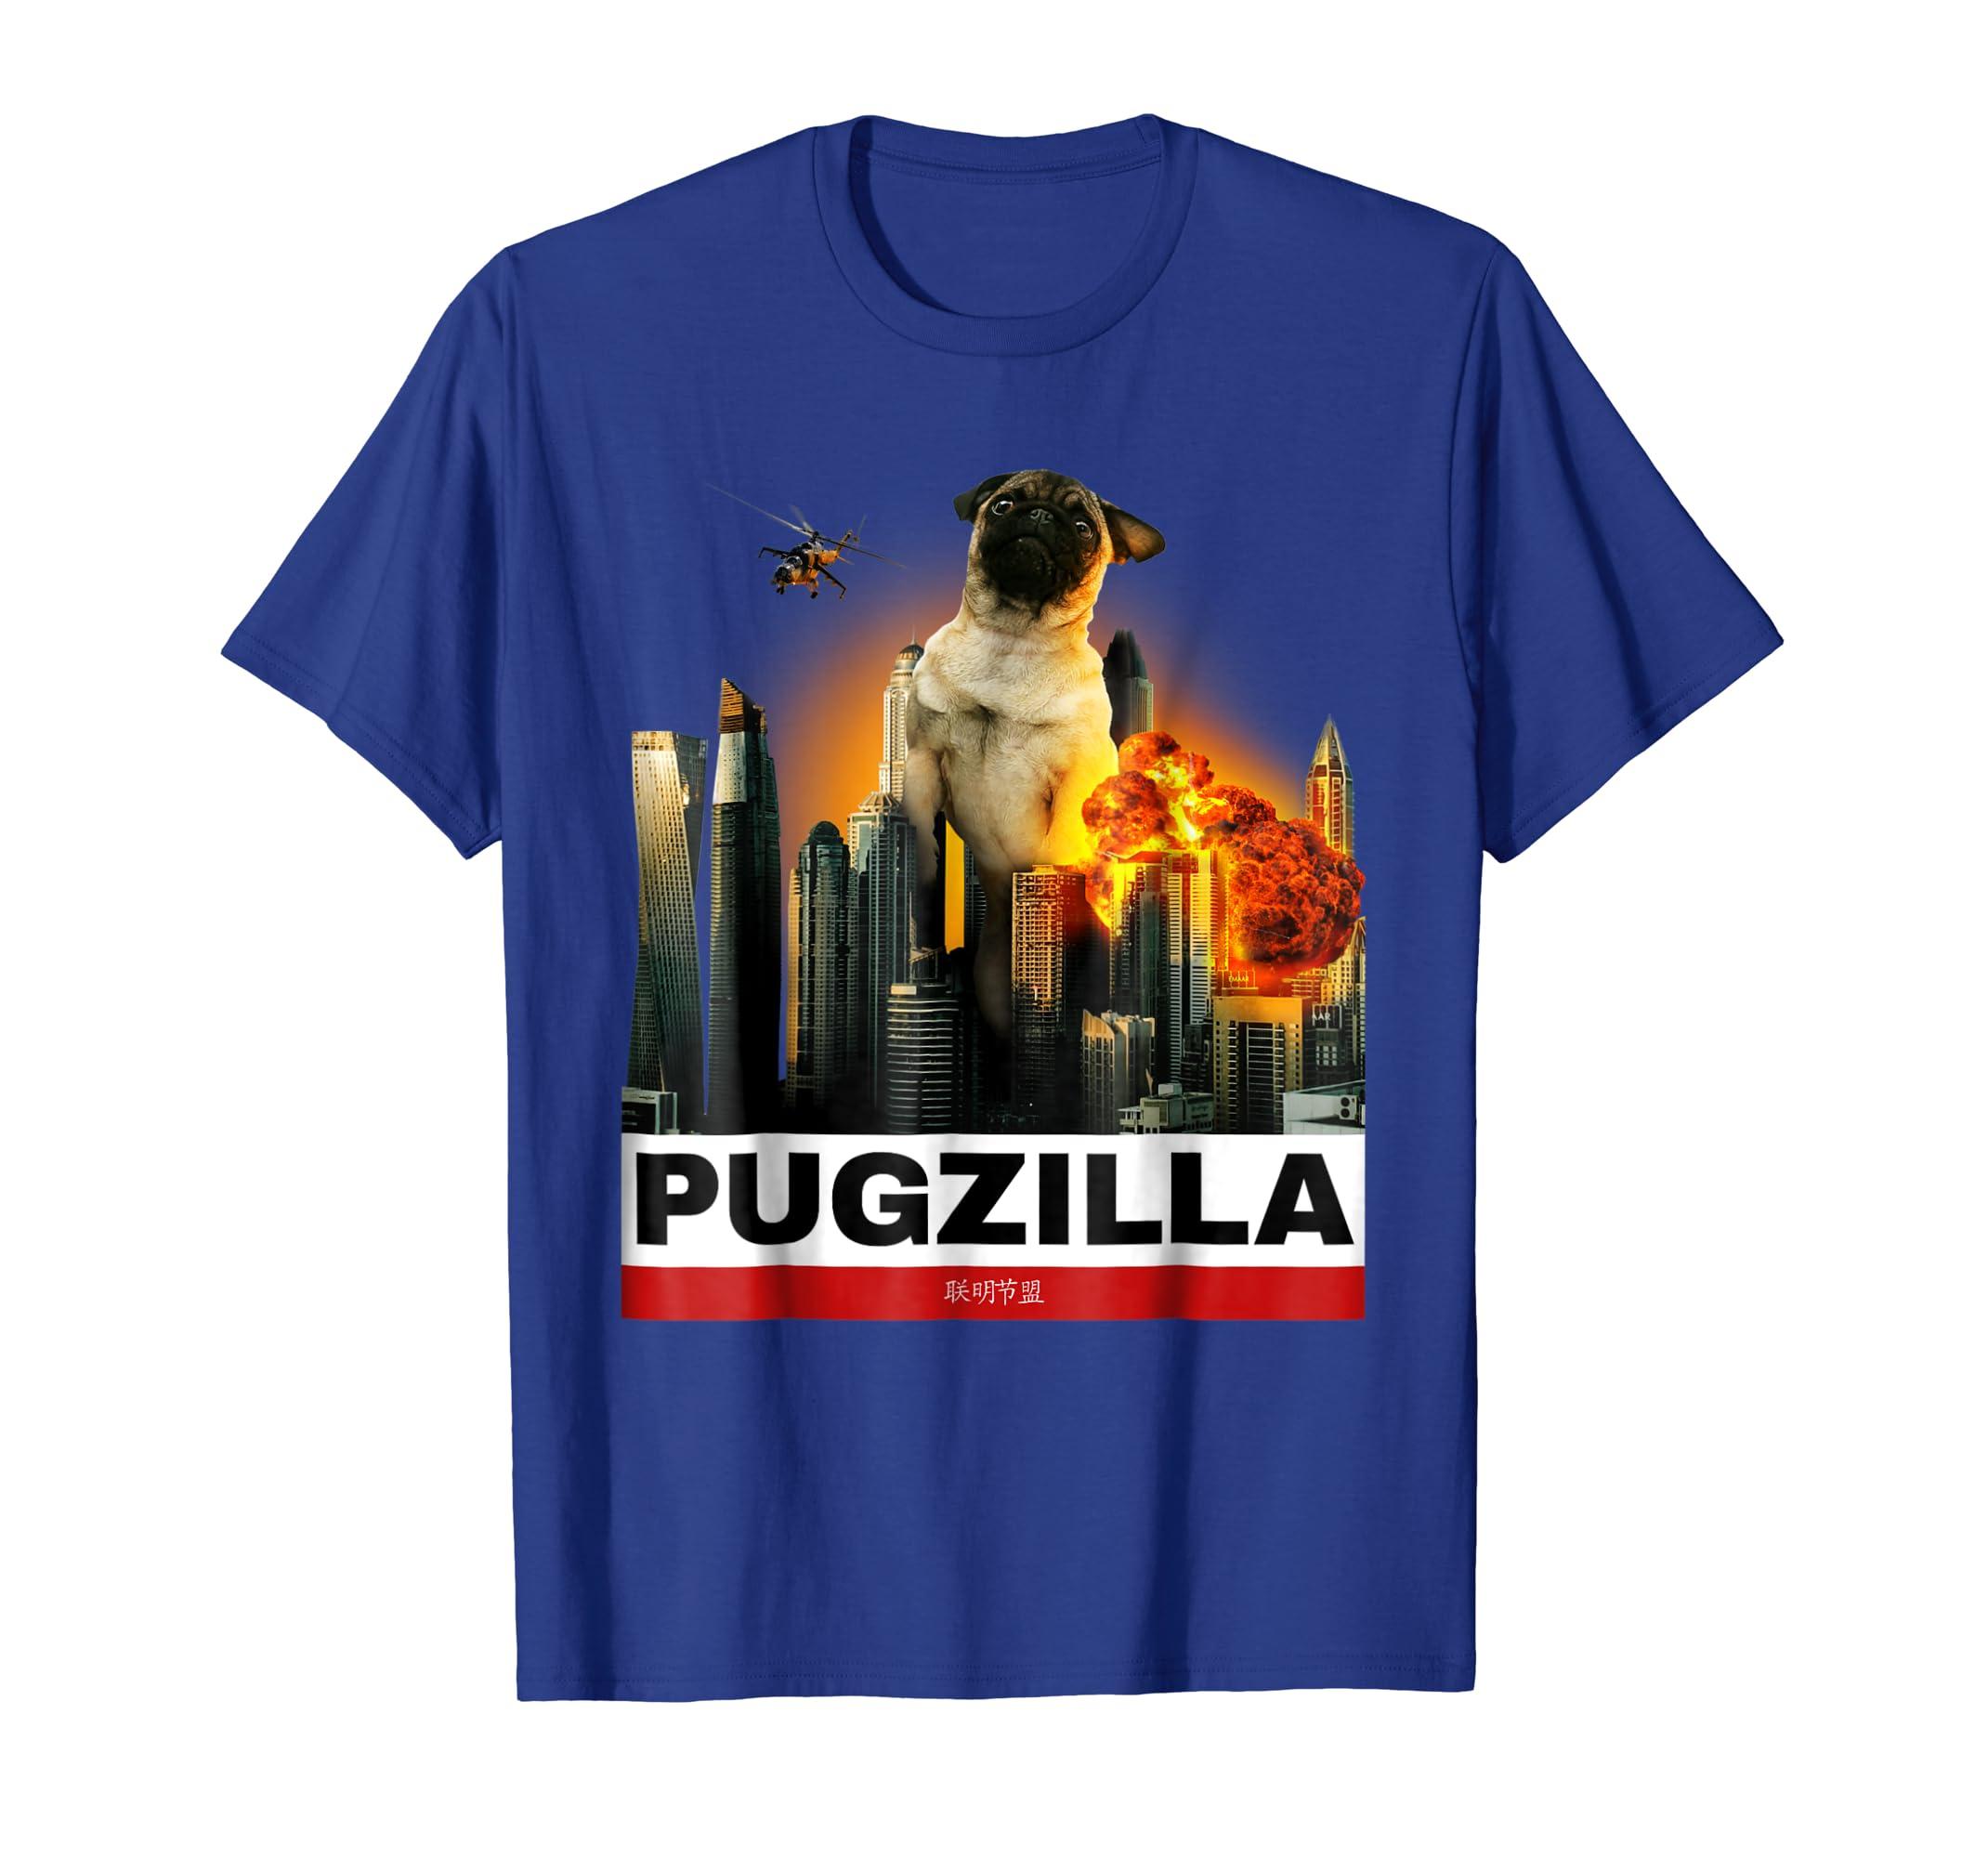 7e2cc149 Amazon.com: PUGZILLA - Funny Pug Tshirt for Dog lovers to Halloween:  Clothing